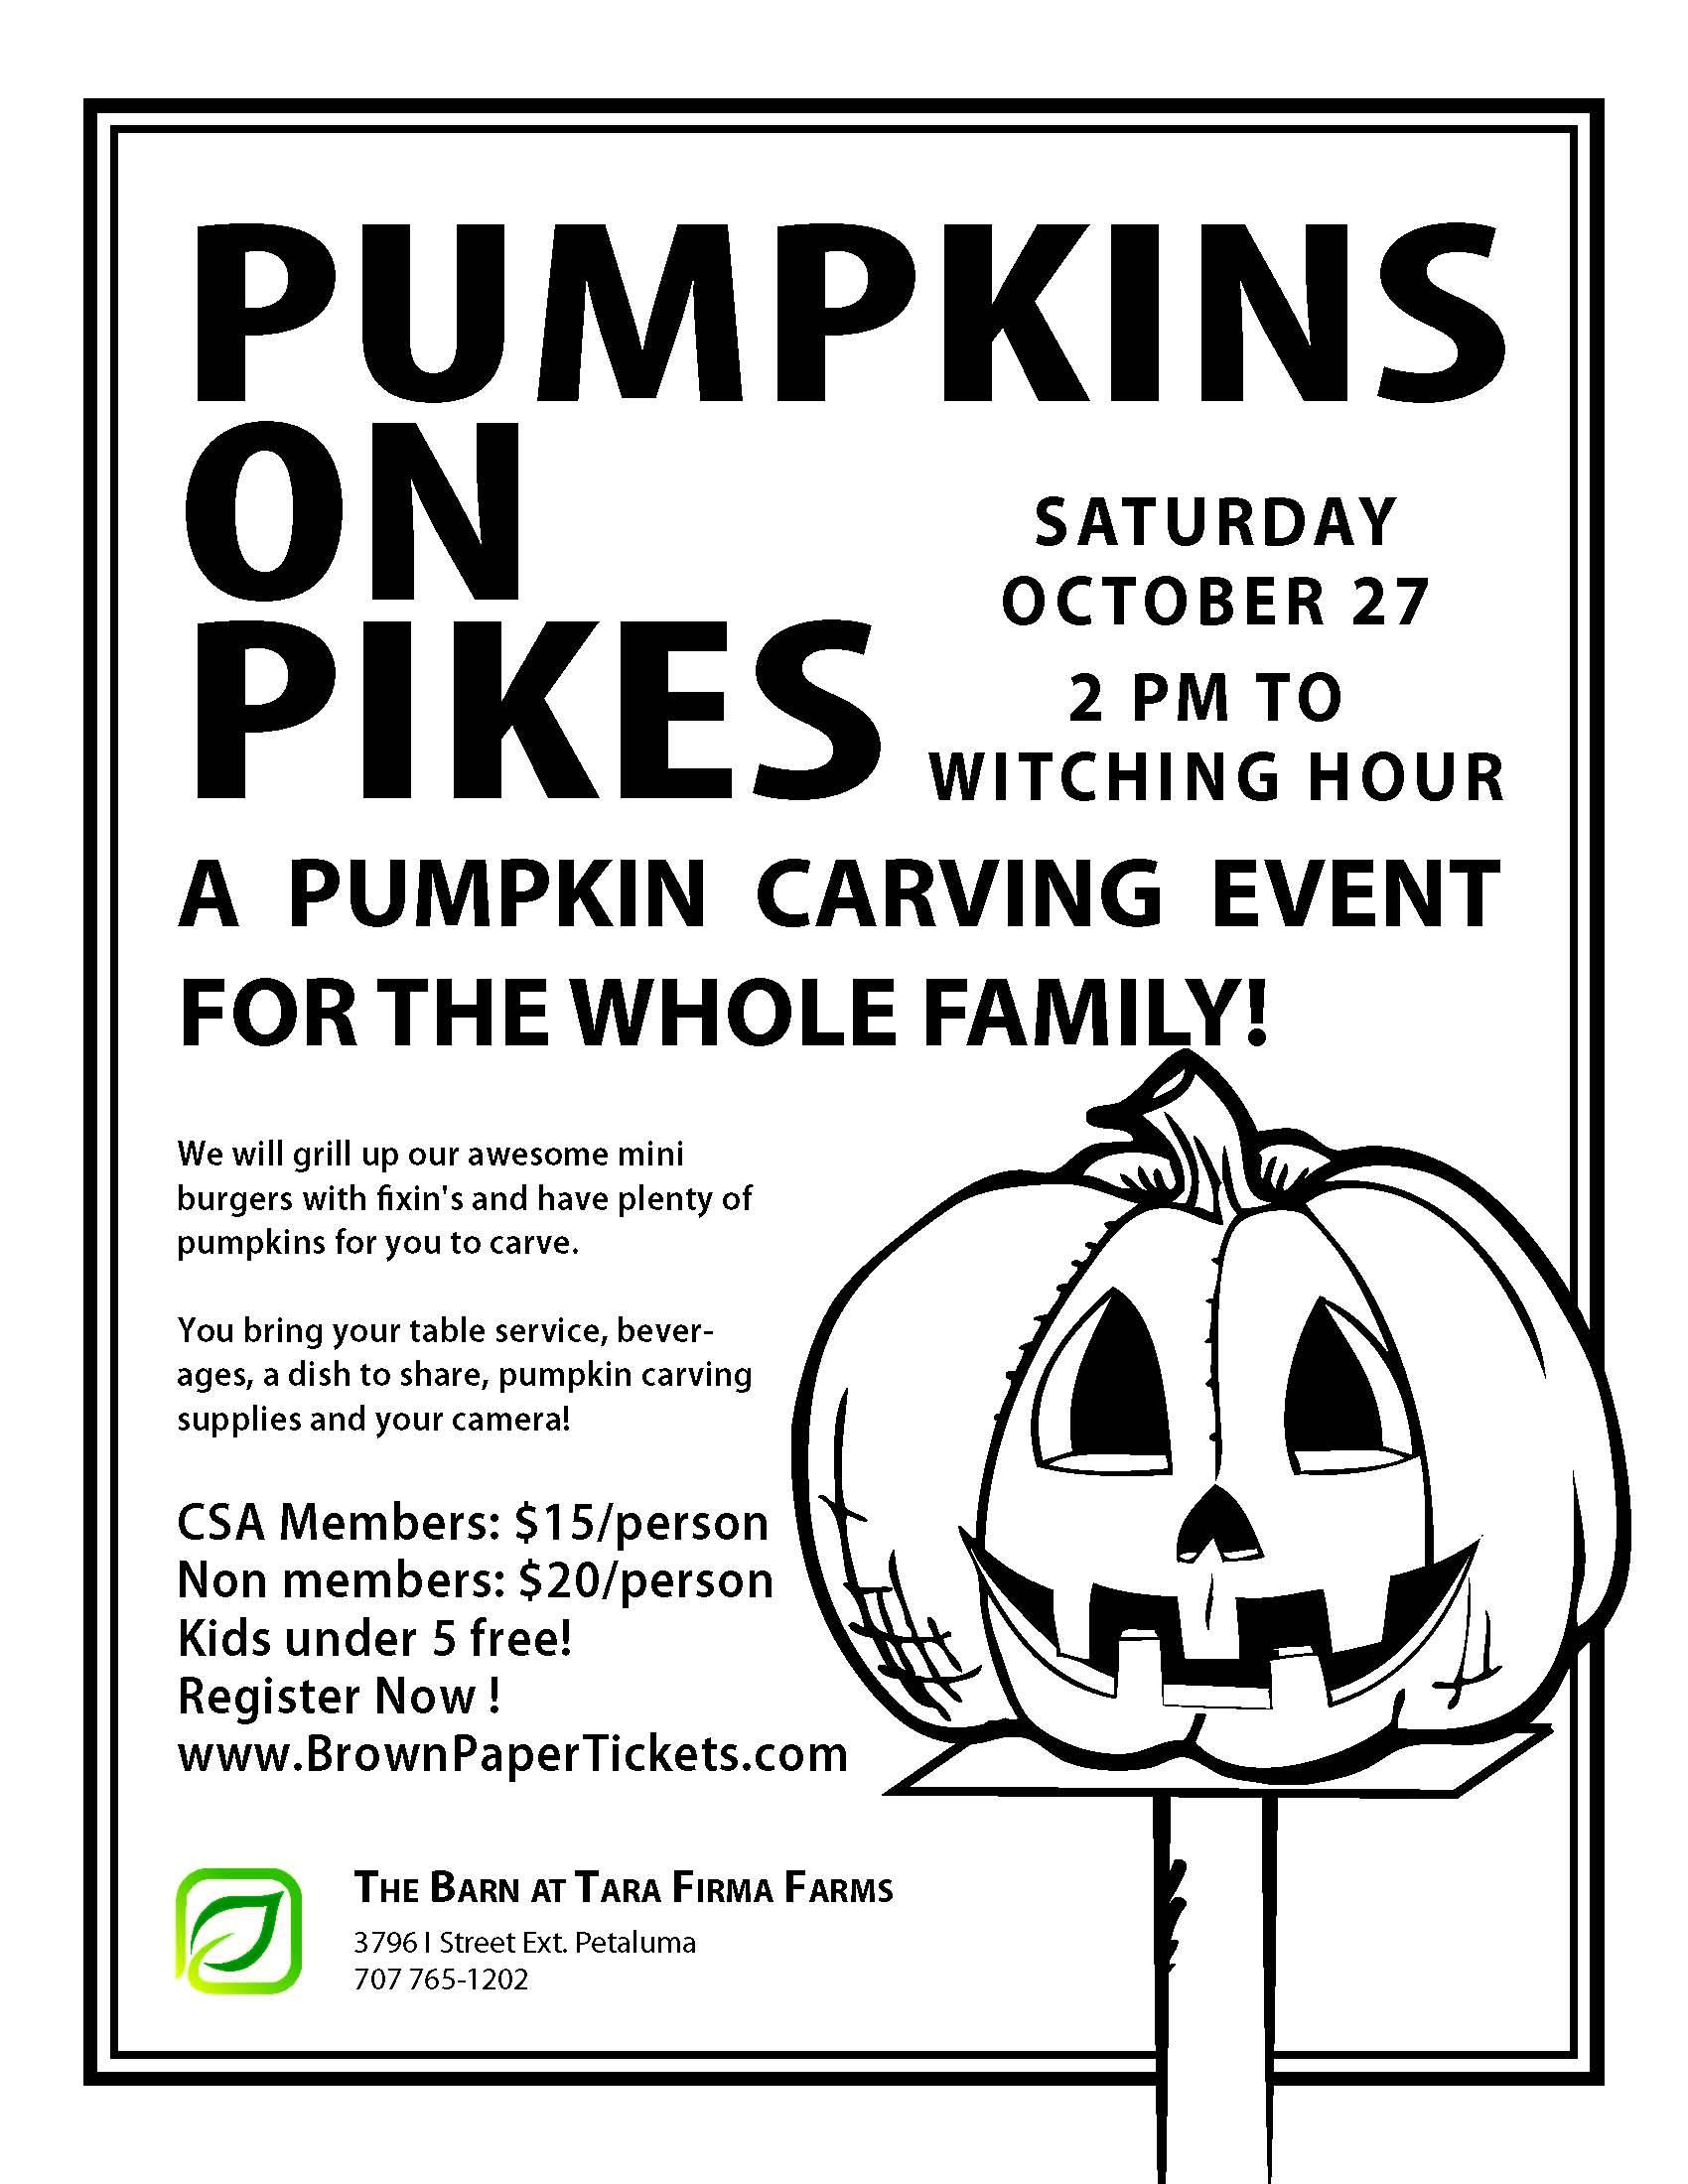 Tara Firma Farms Pumpkins on Pikes - Top Pick for Fall